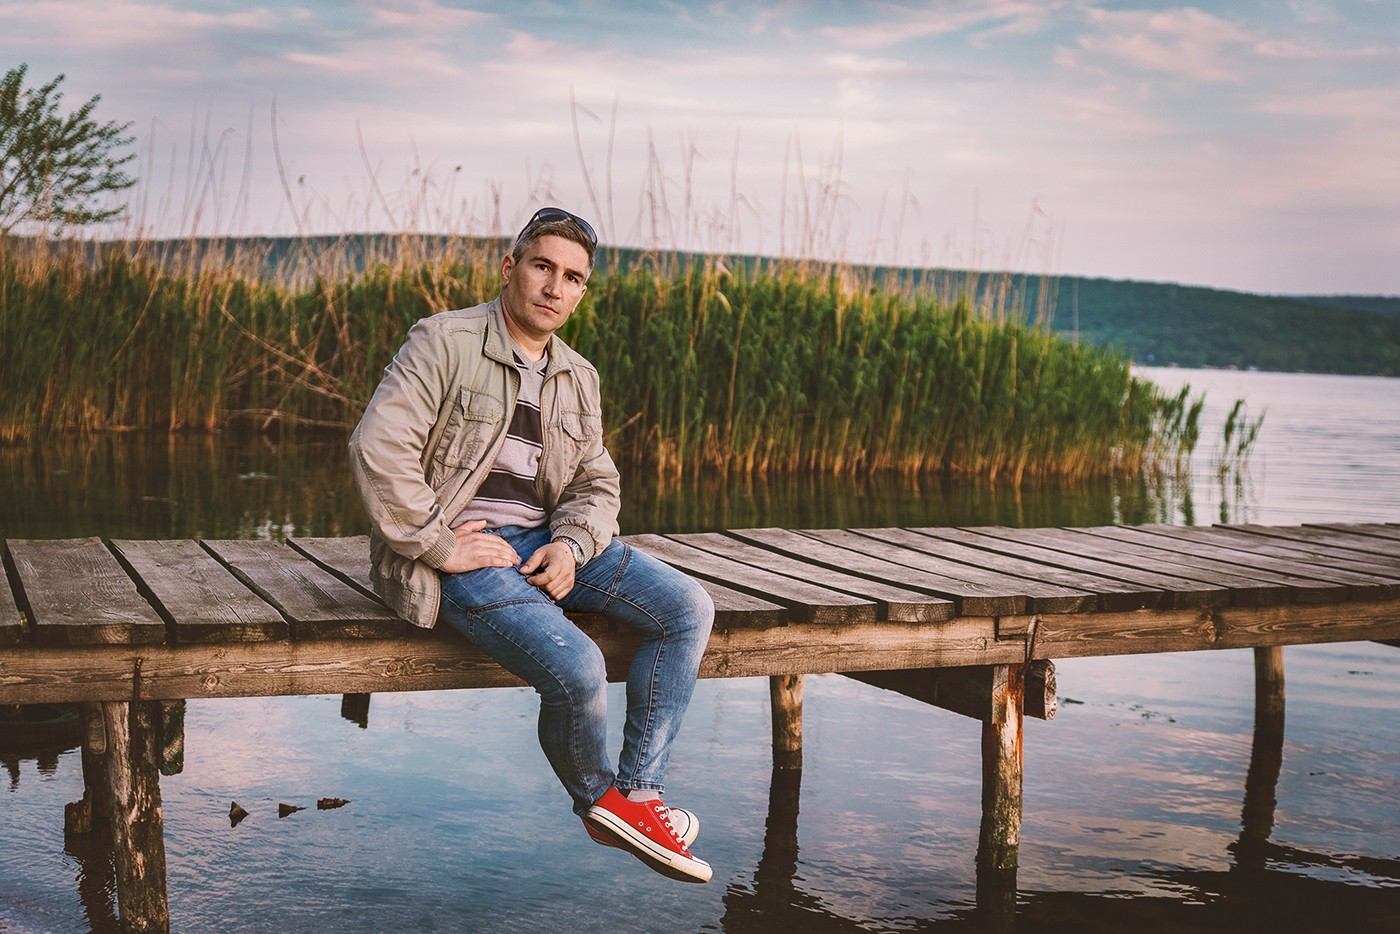 profesionalen-fotograf-varna-foto-zasnemane-ivan-kolev-photography.